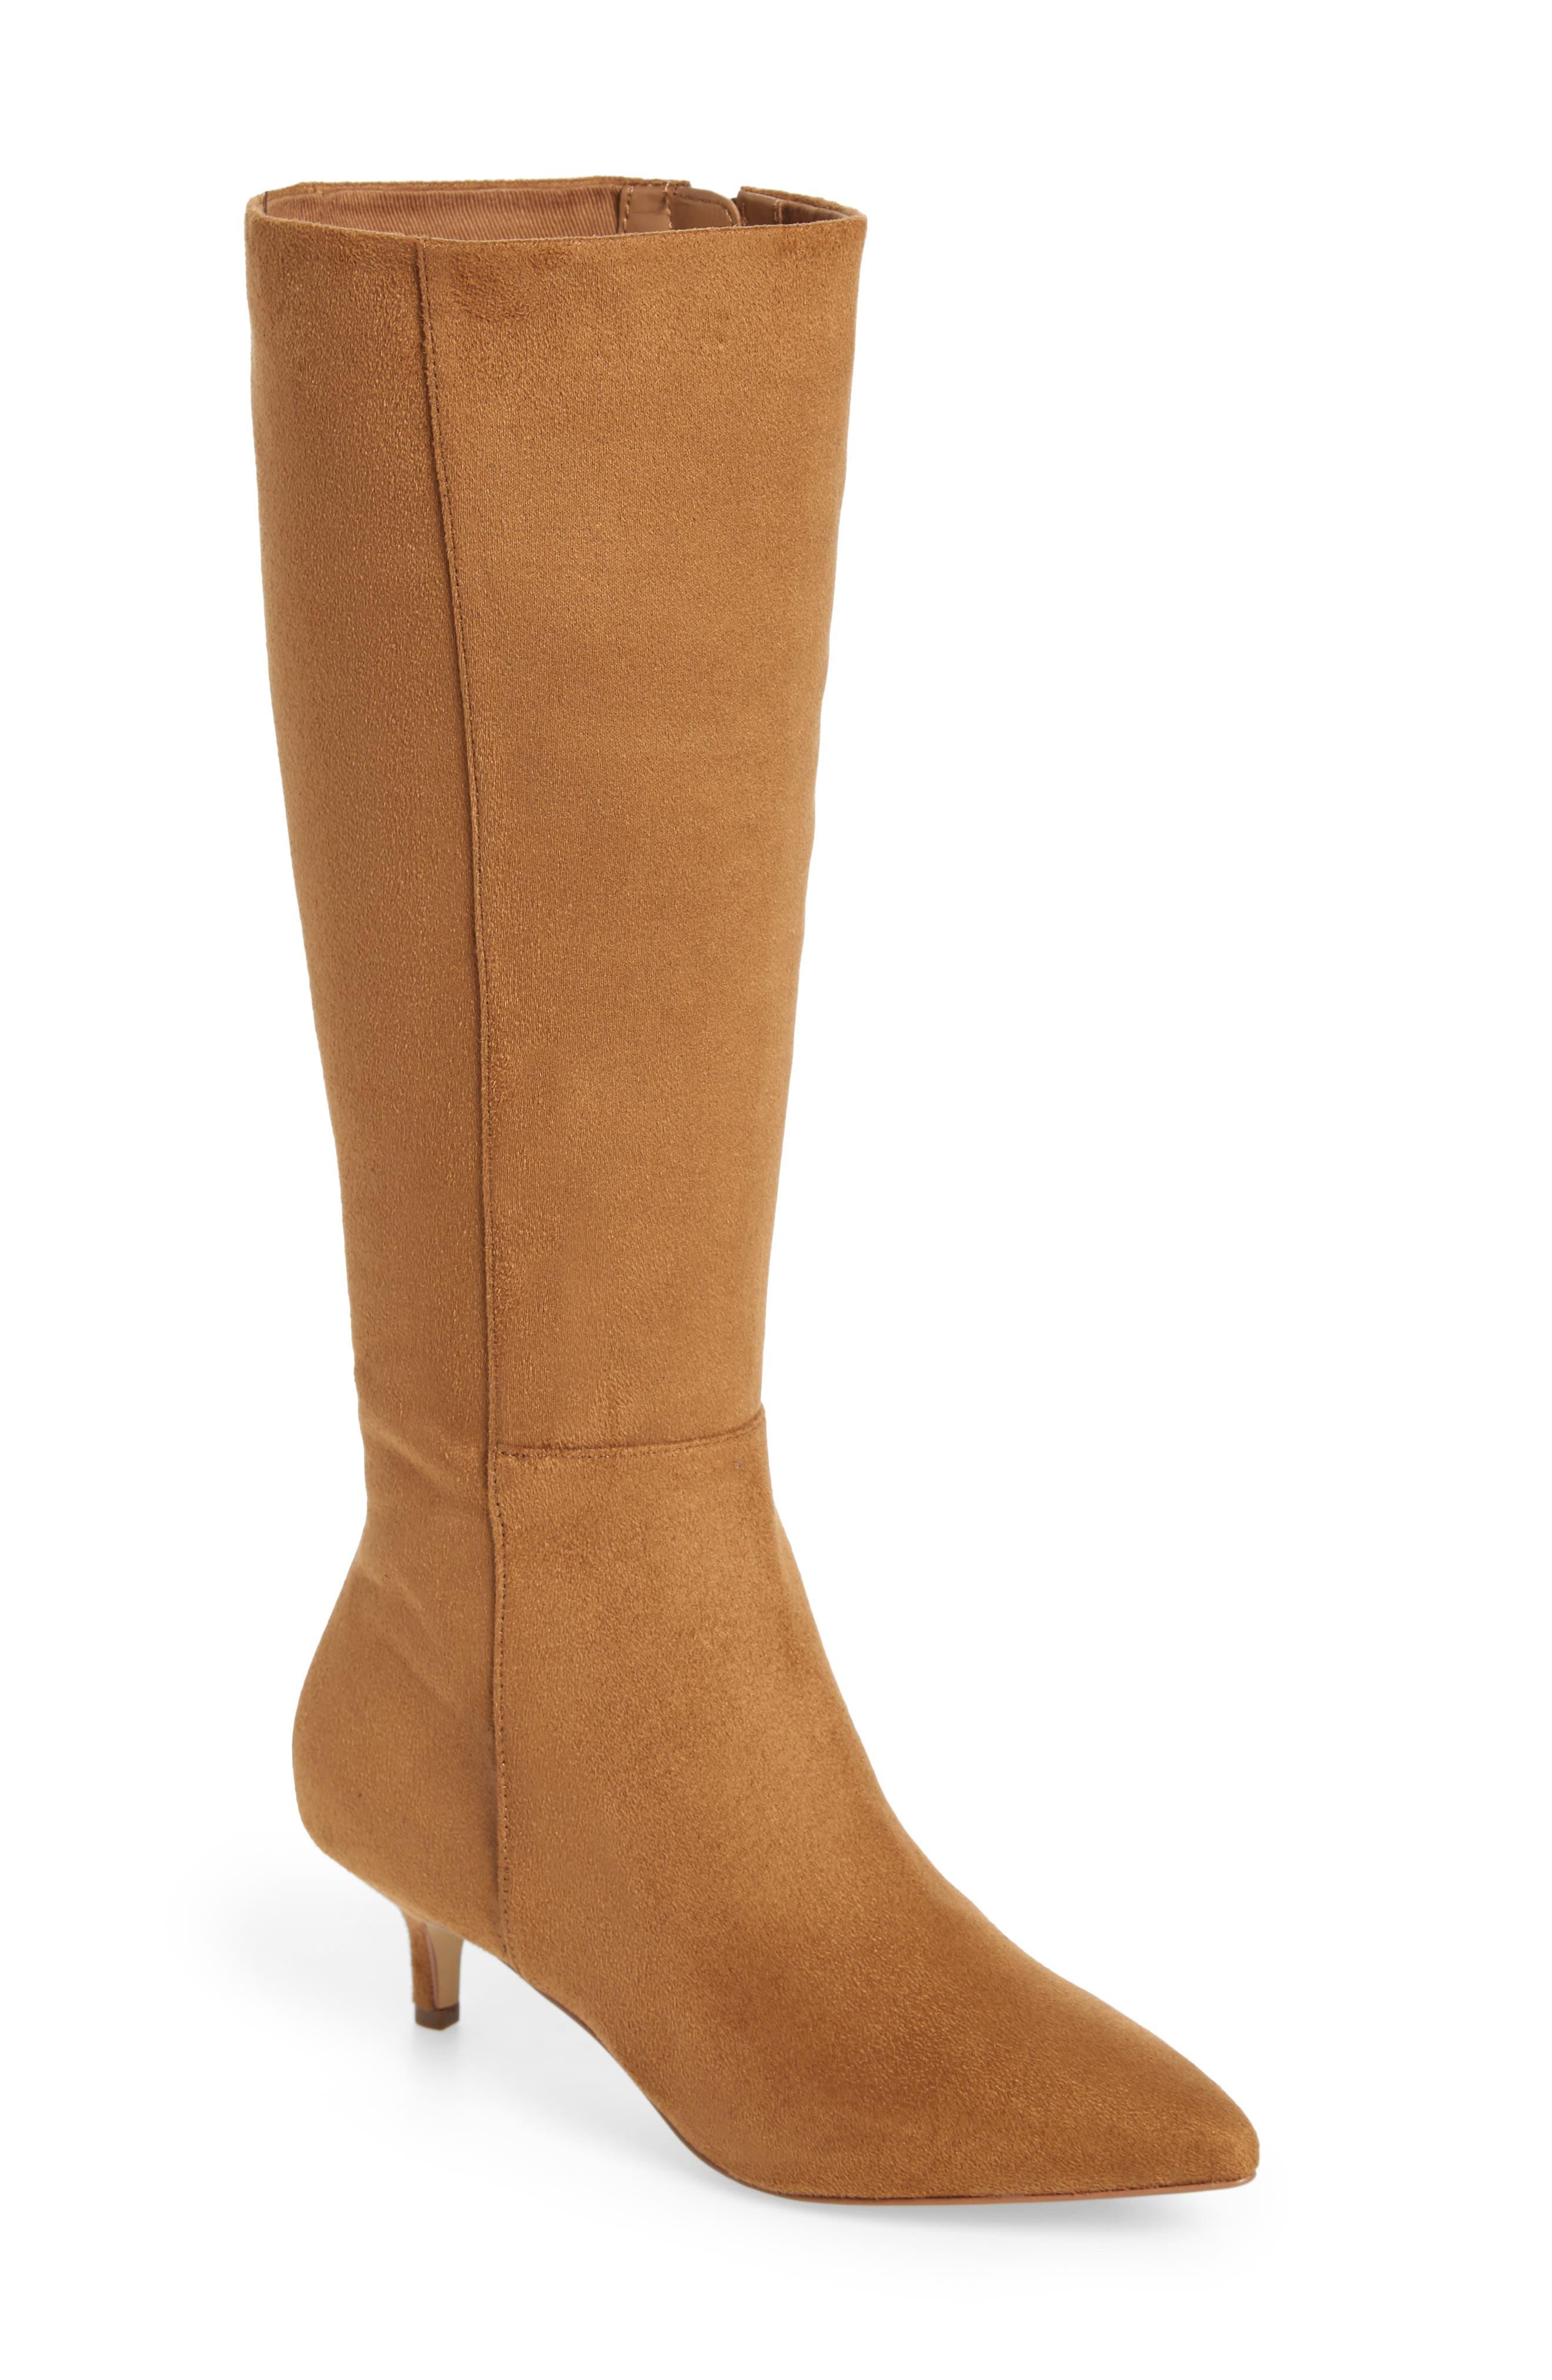 Athena Alexander Lyon Knee High Boot, Brown